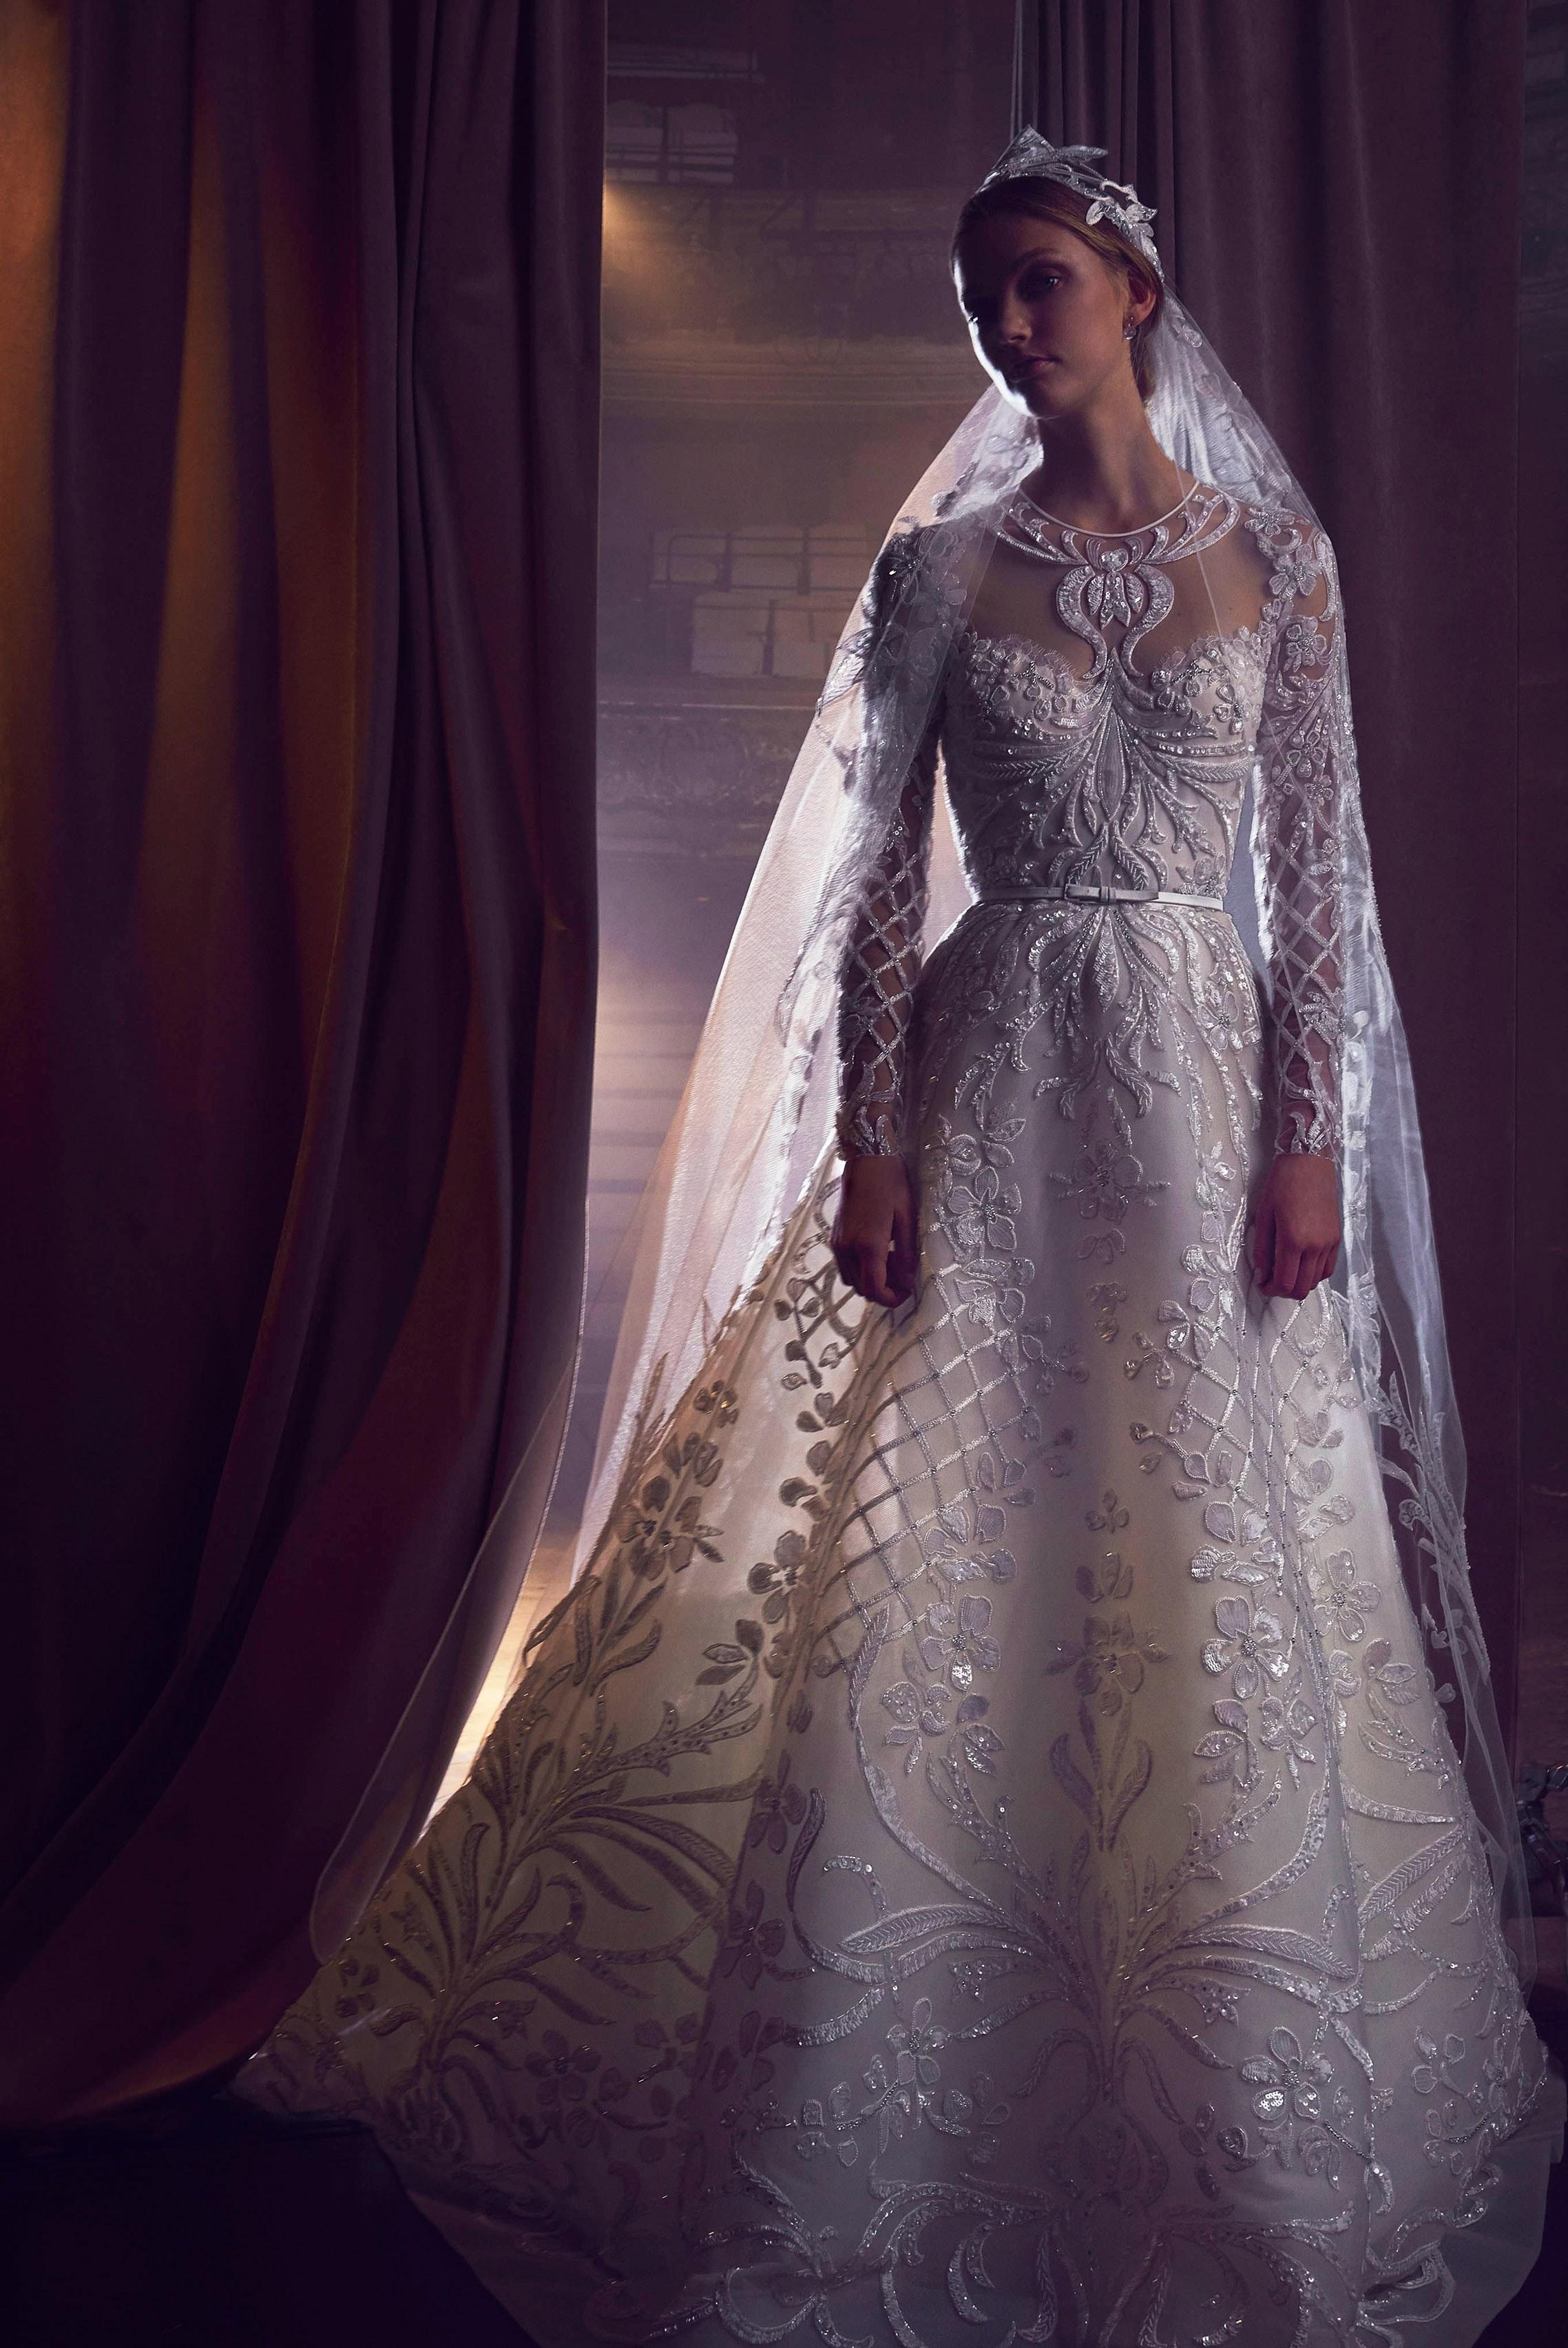 Christina Mourad S Wedding Dress Details As She Weds Elie Saab